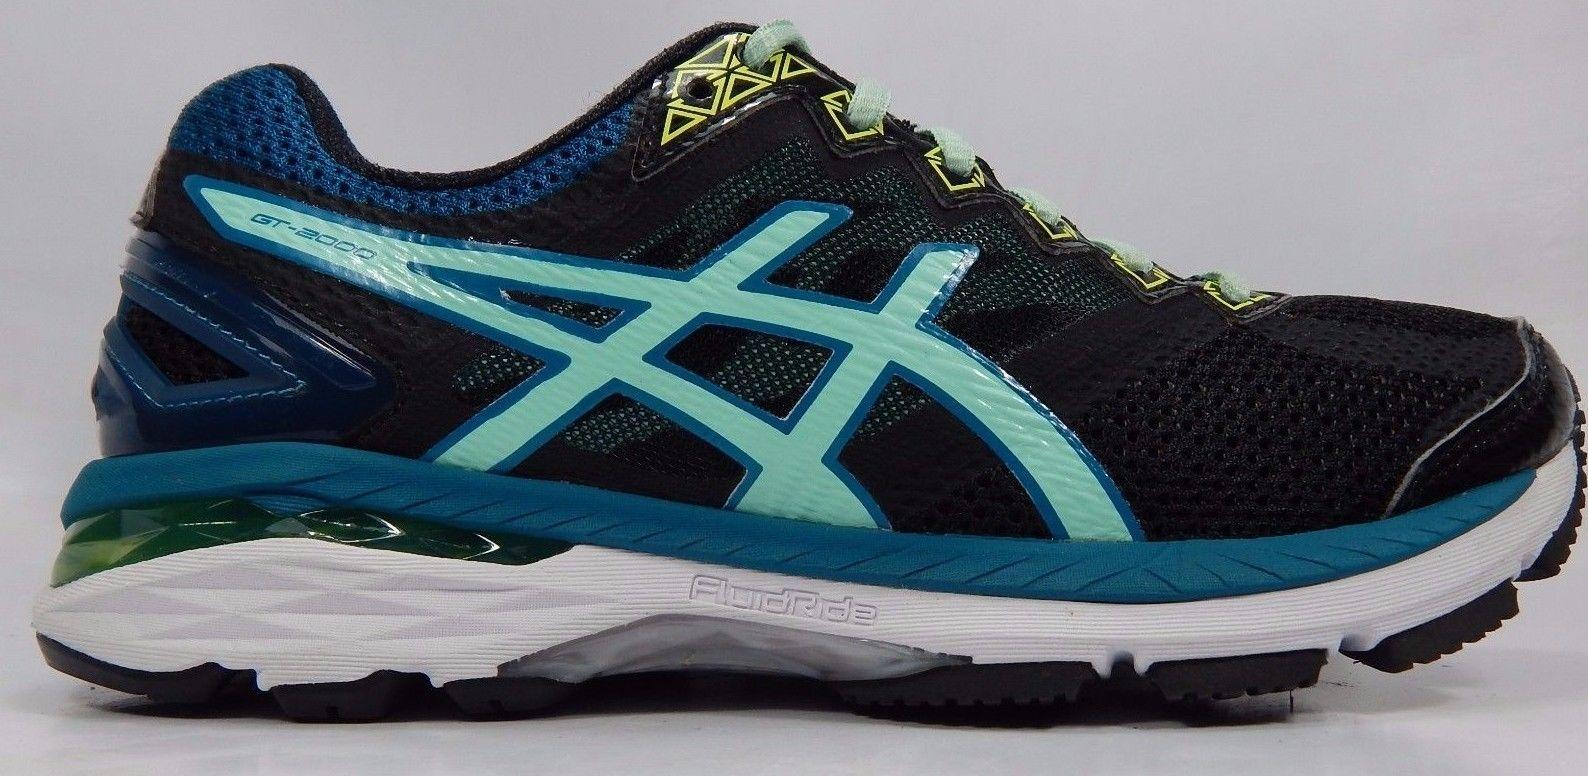 Asics GT 2000 v 4 Women's Running Shoes Size US 7 M (B) EU 38 Black T656N